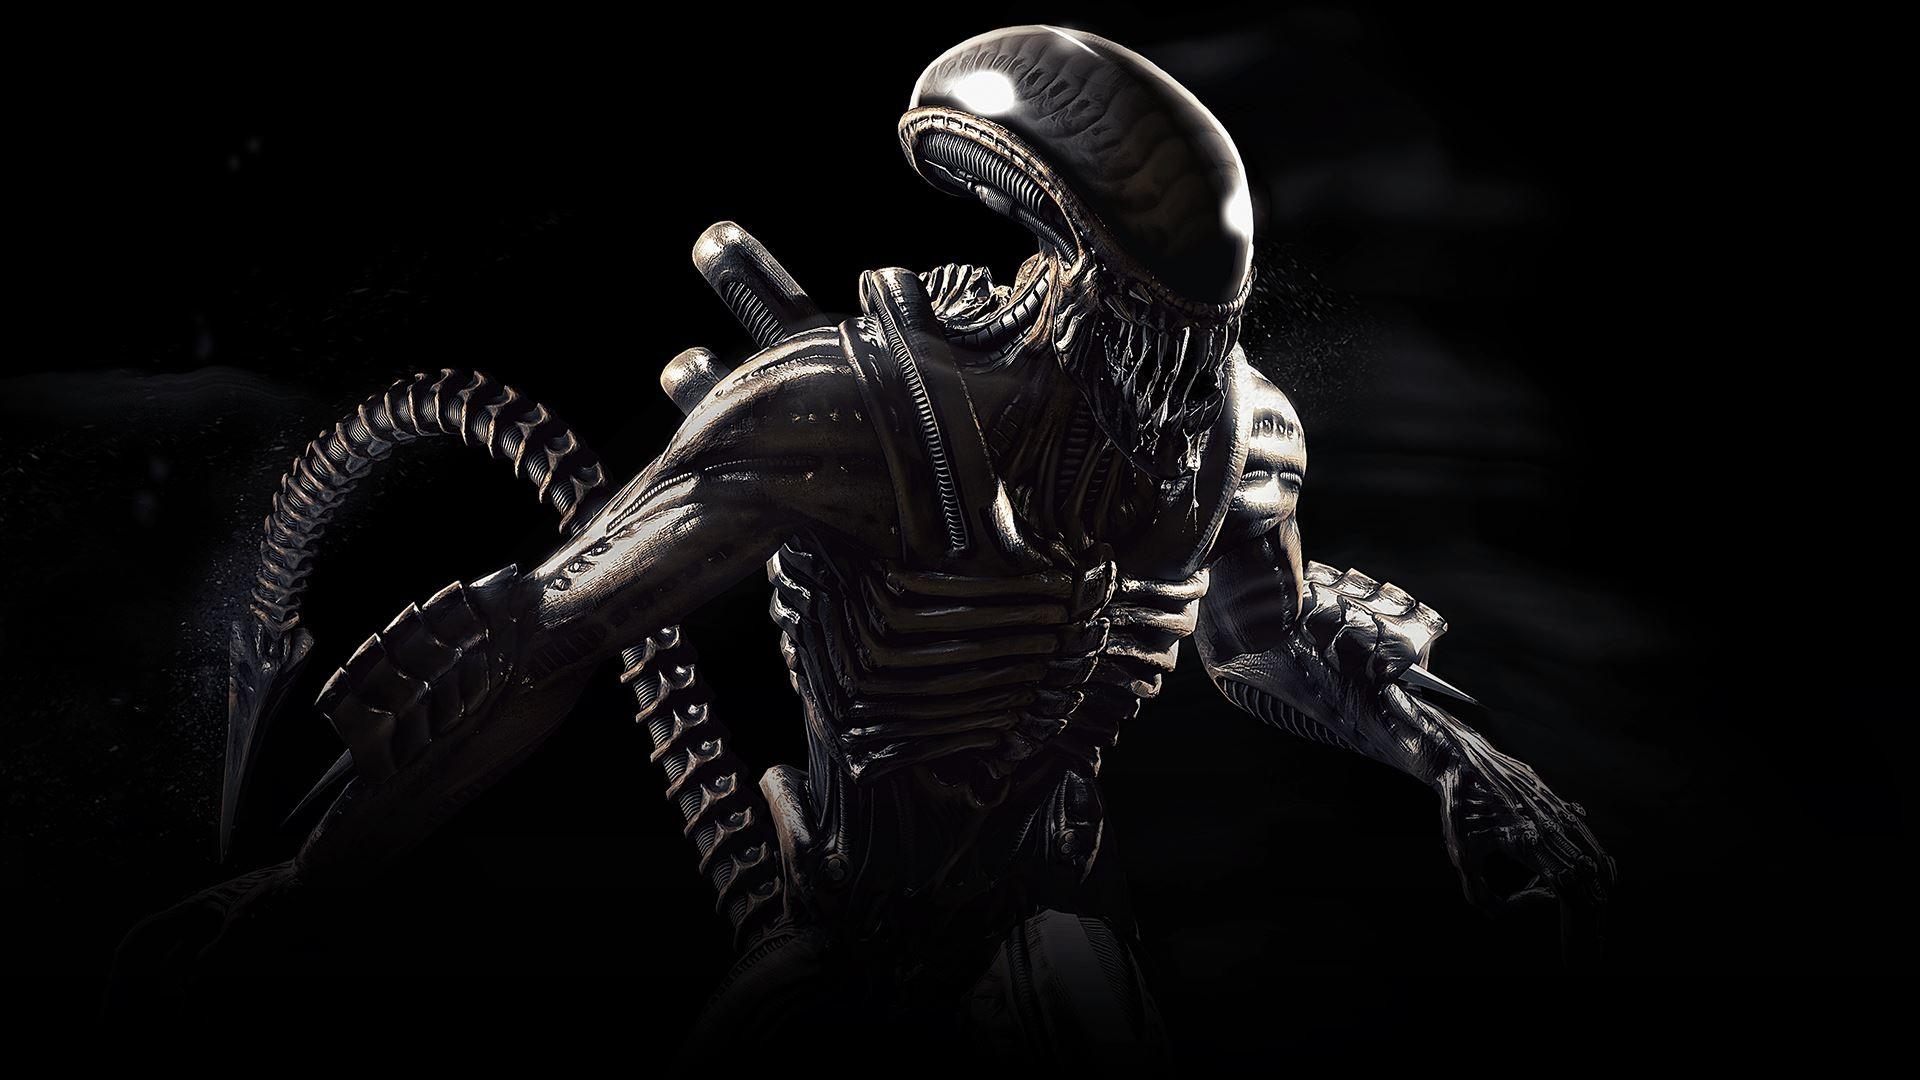 Alien Mortal Kombat X